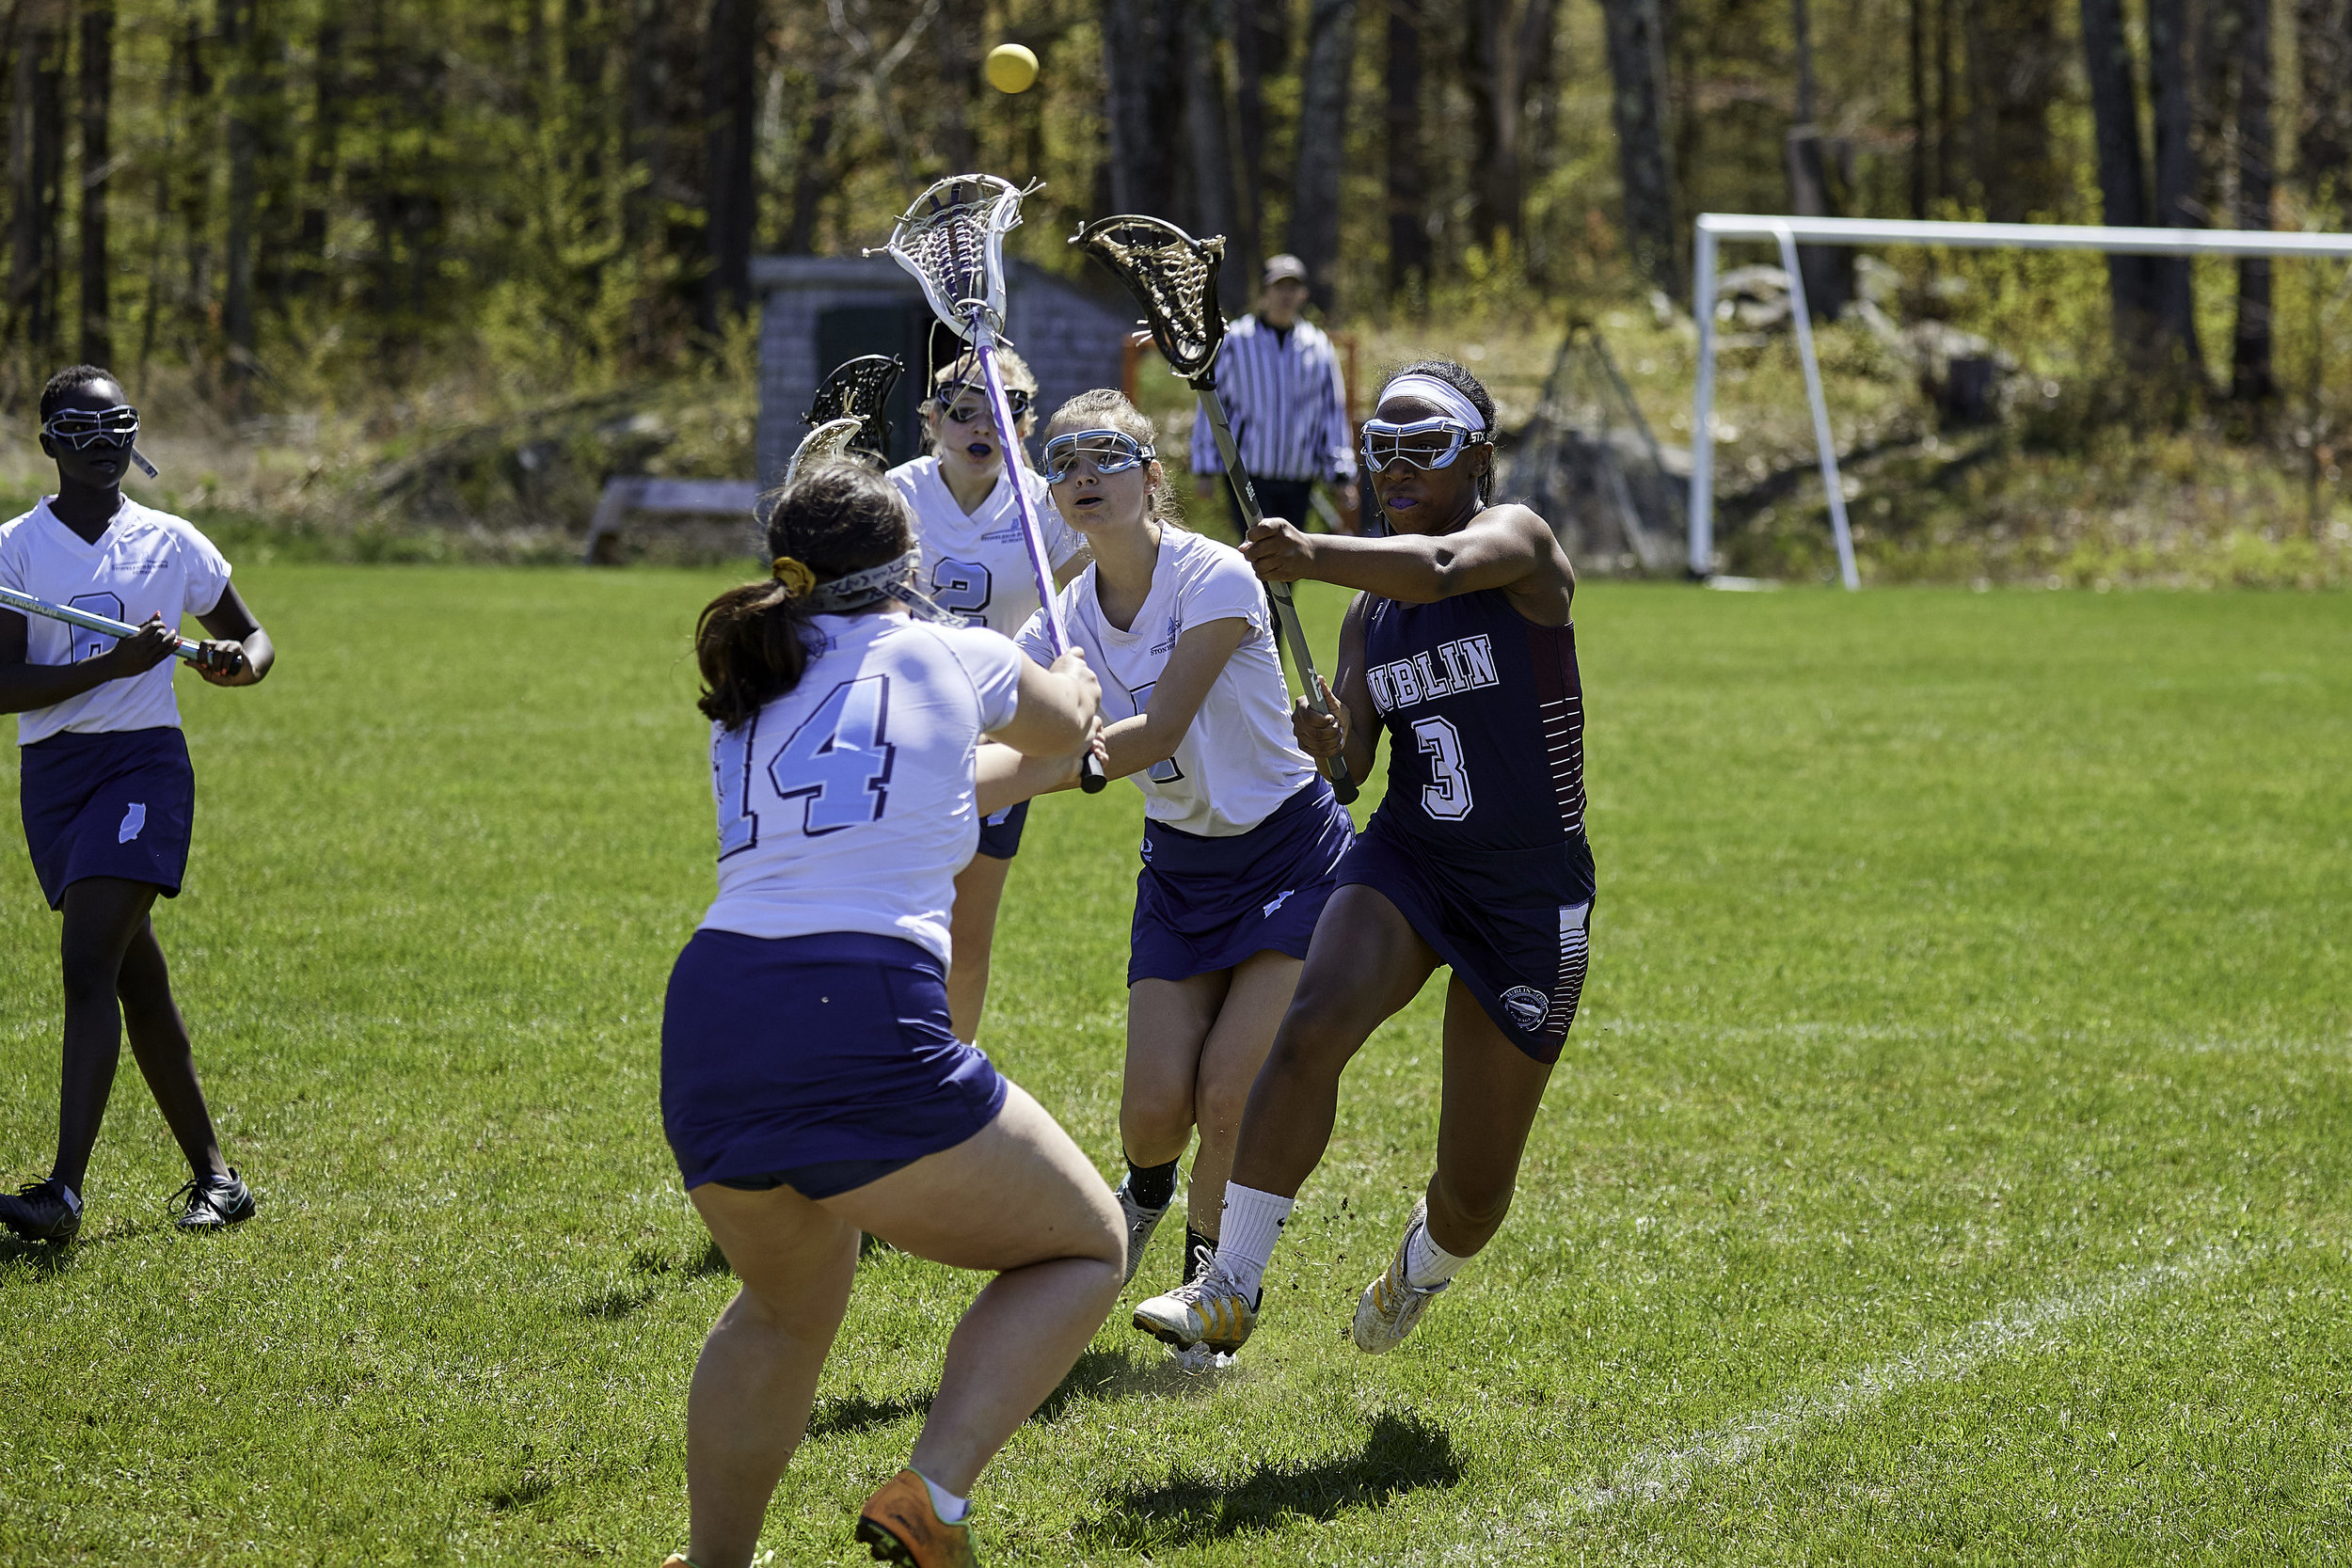 Girls Lacrosse vs. Stoneleigh Burnham School - May 11, 2019 - May 10, 2019193228.jpg